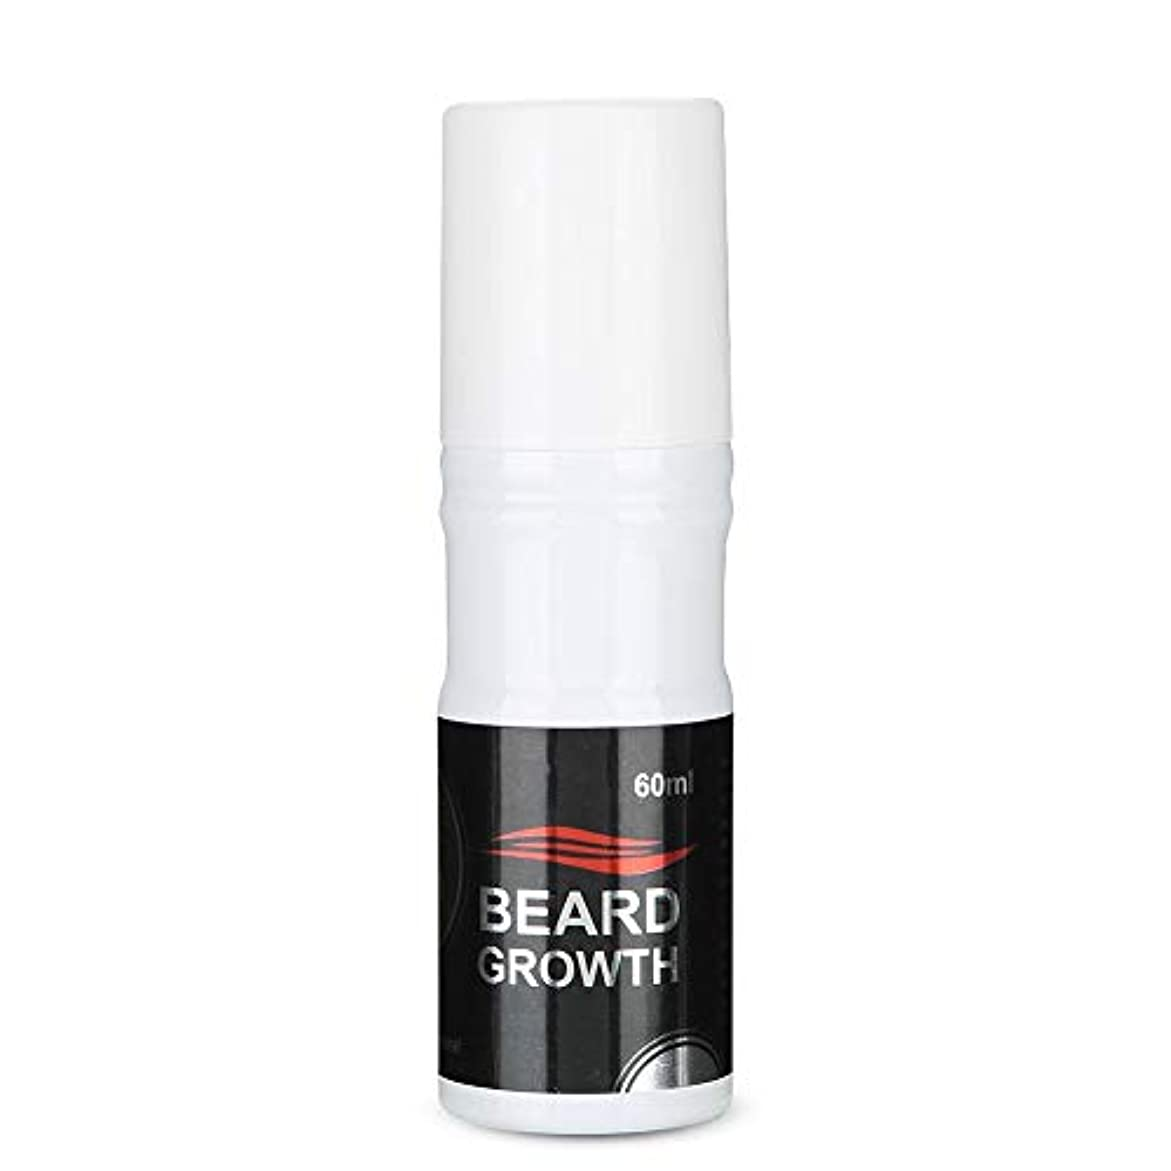 Semme 60ml男性のひげの成長のスプレー、より厚いのための自然で加速するひげの成長オイルの顔の毛の成長Lequidおよびより完全なひげ